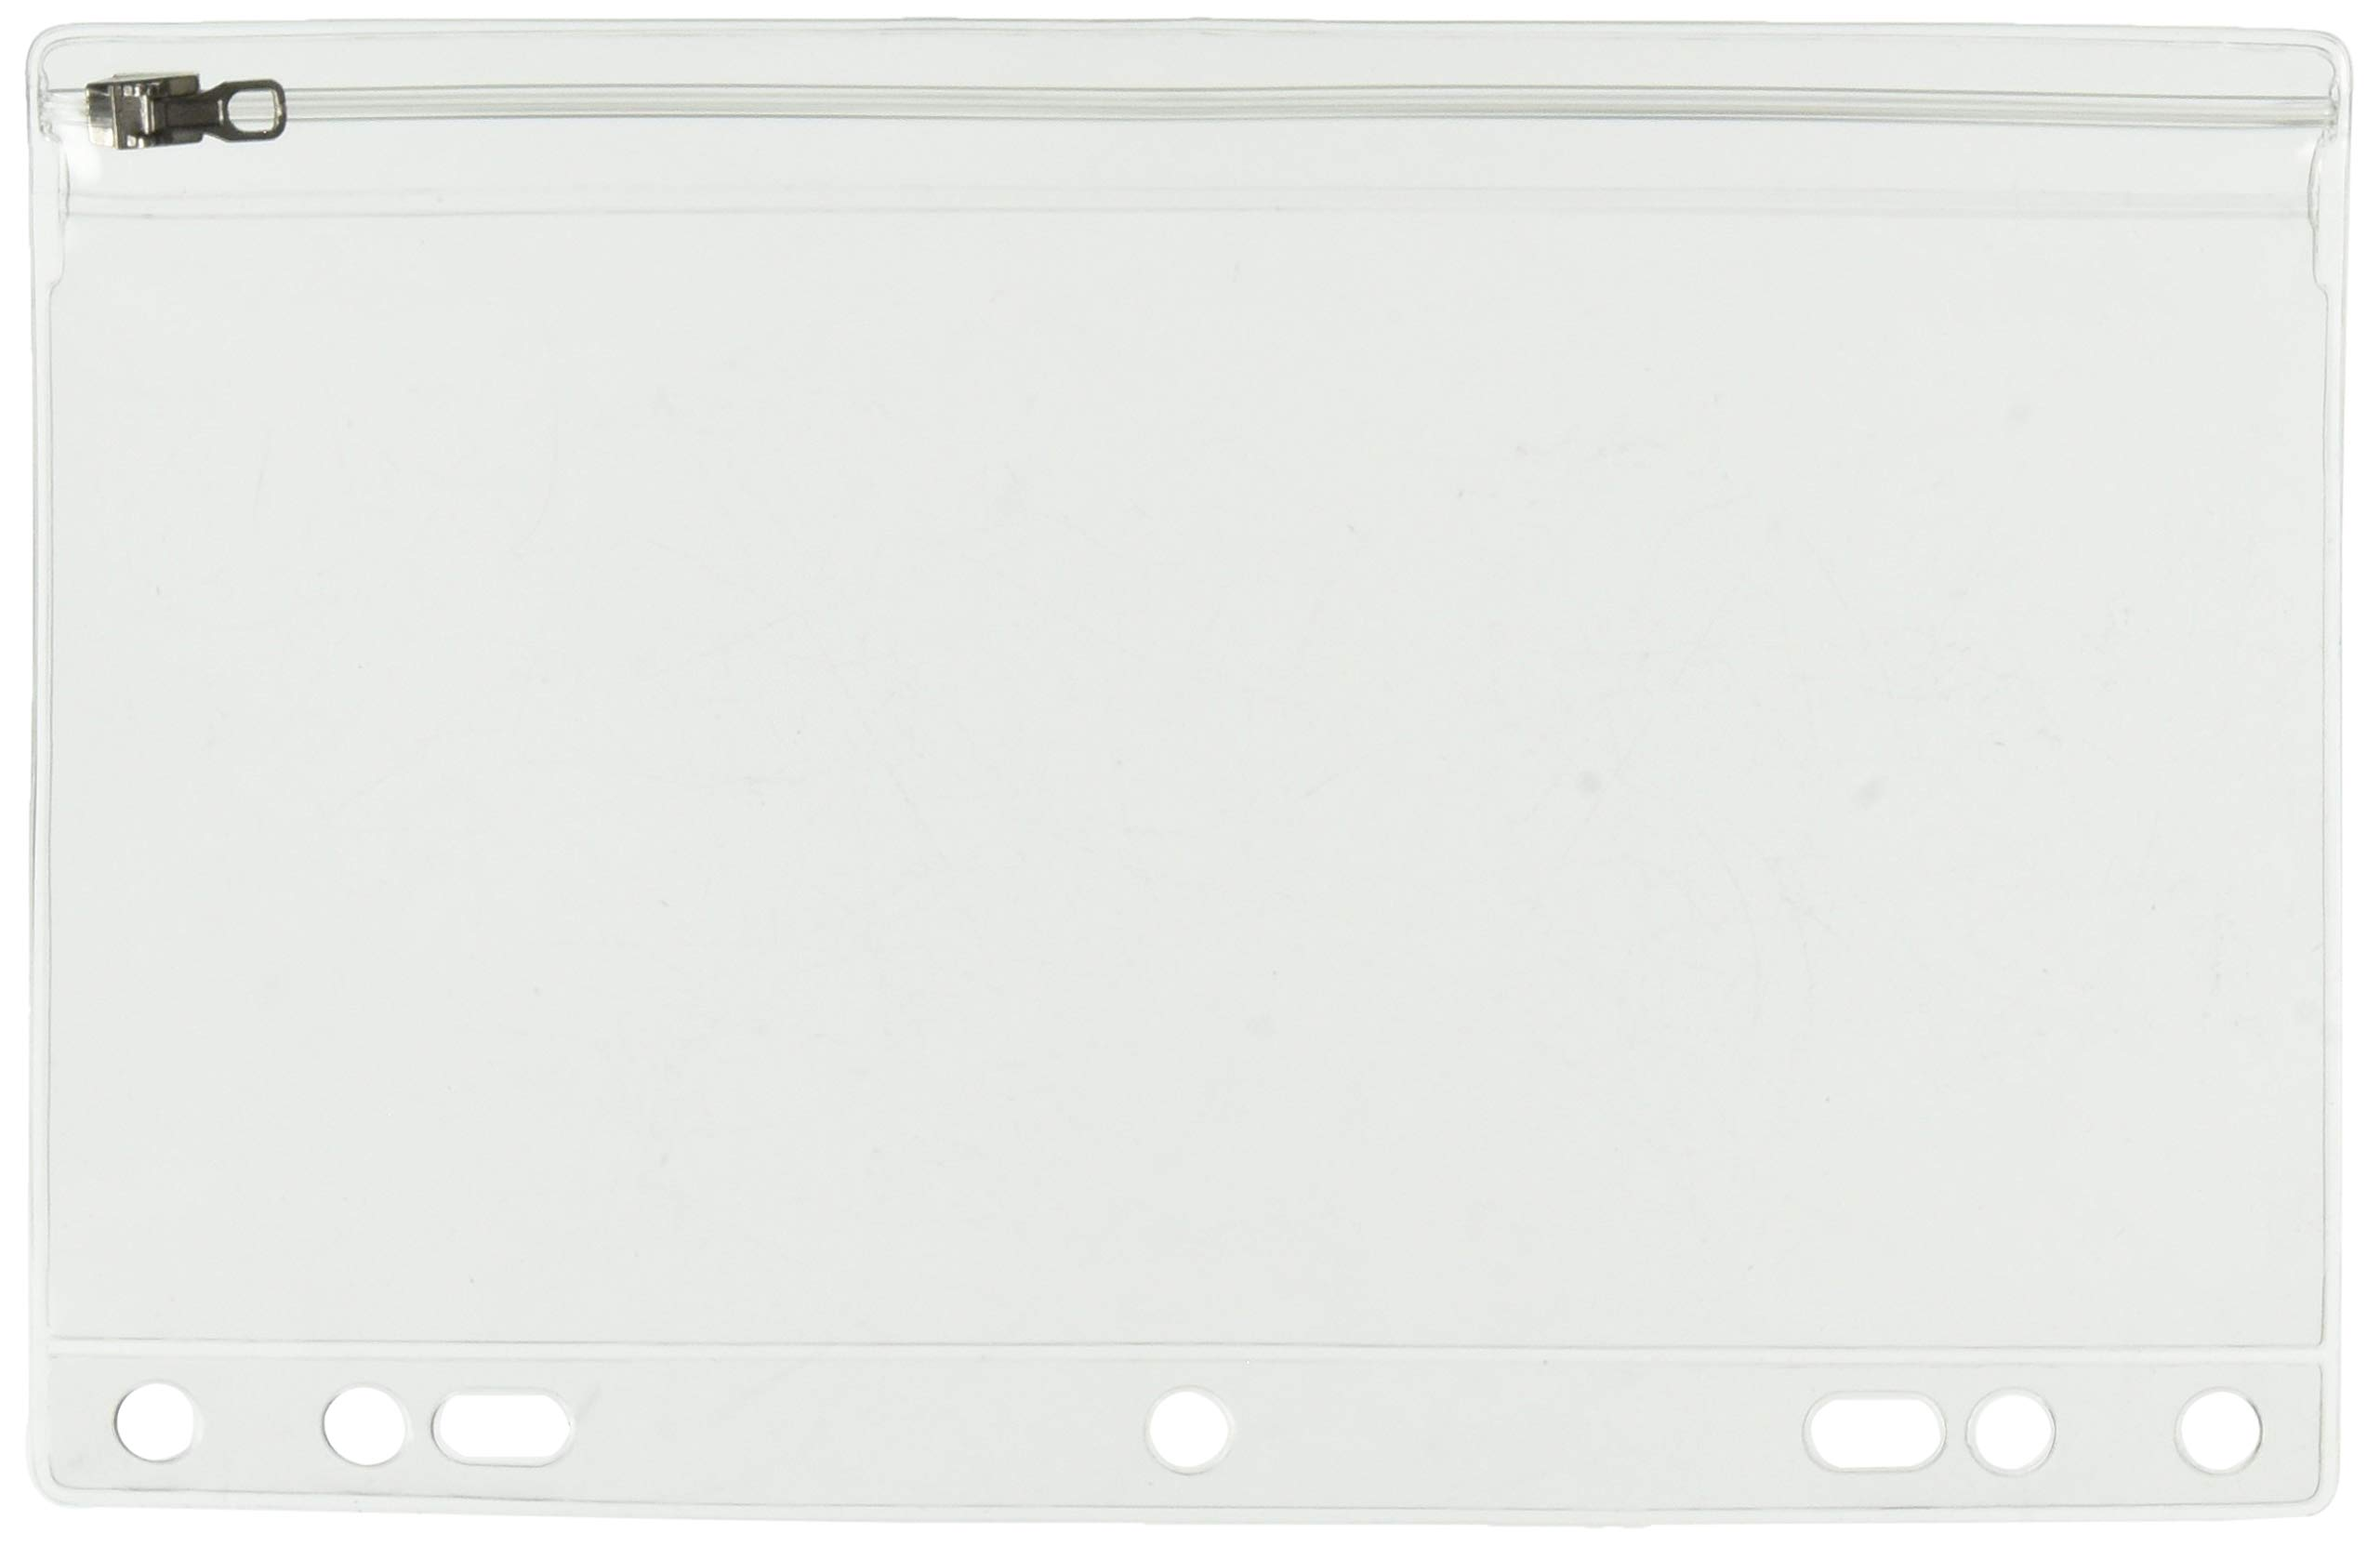 SPR01606 - Vinyl Ring Binder Pocket, 9-1/2x6, Clear, 24 Pack by Sparco